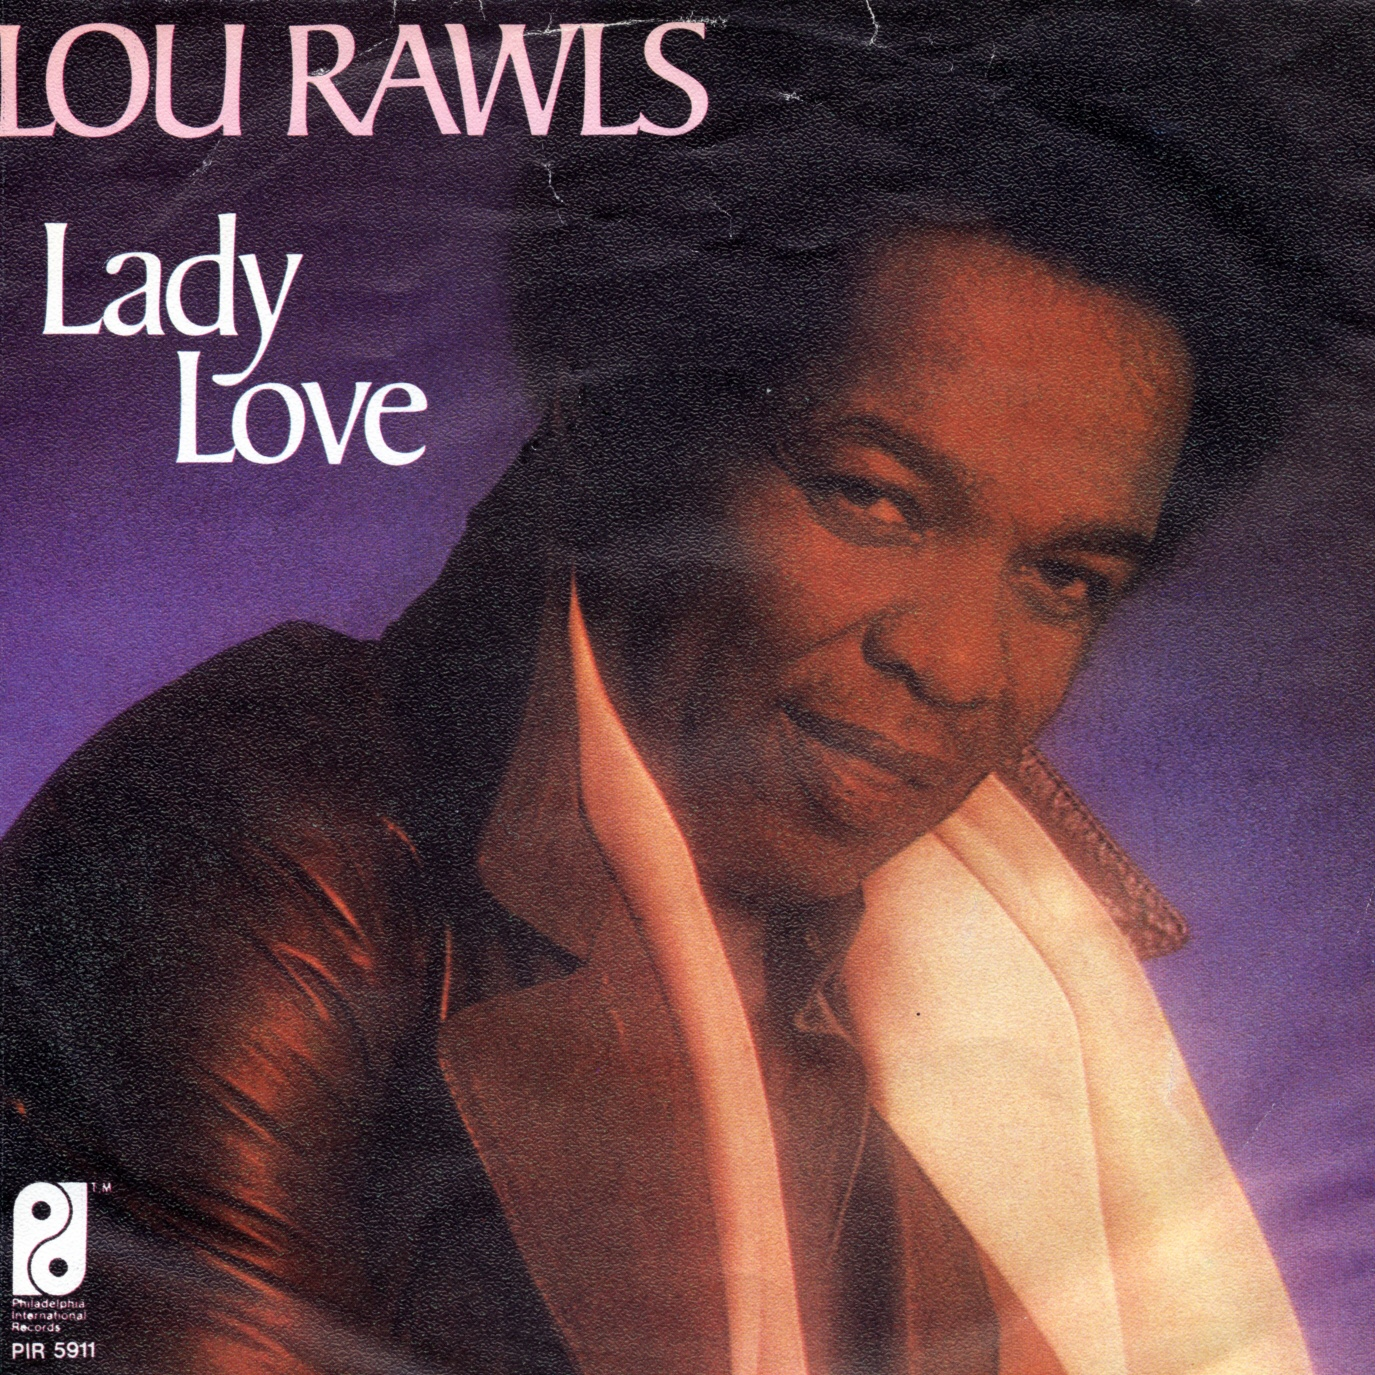 Cover: Lady love, Lou Rawls